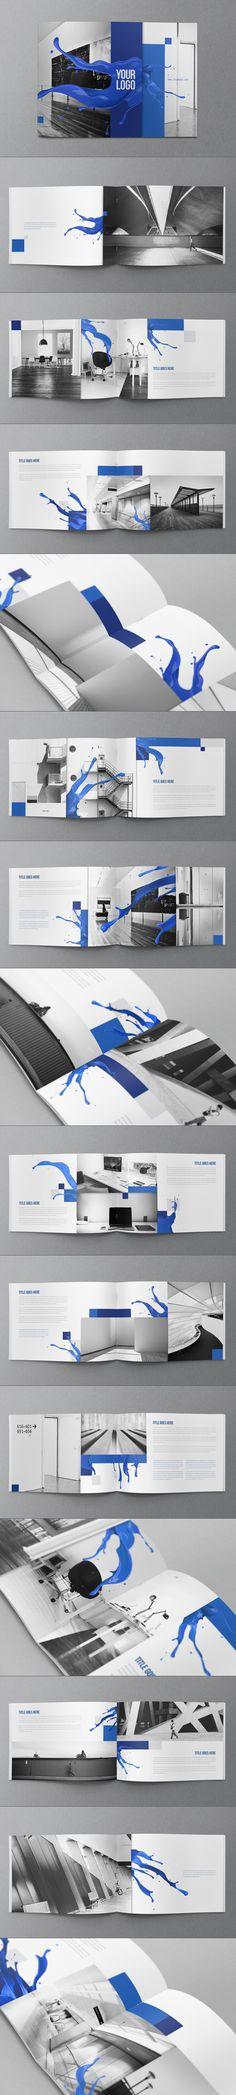 Splash Brochure by Abra Design, via Behance